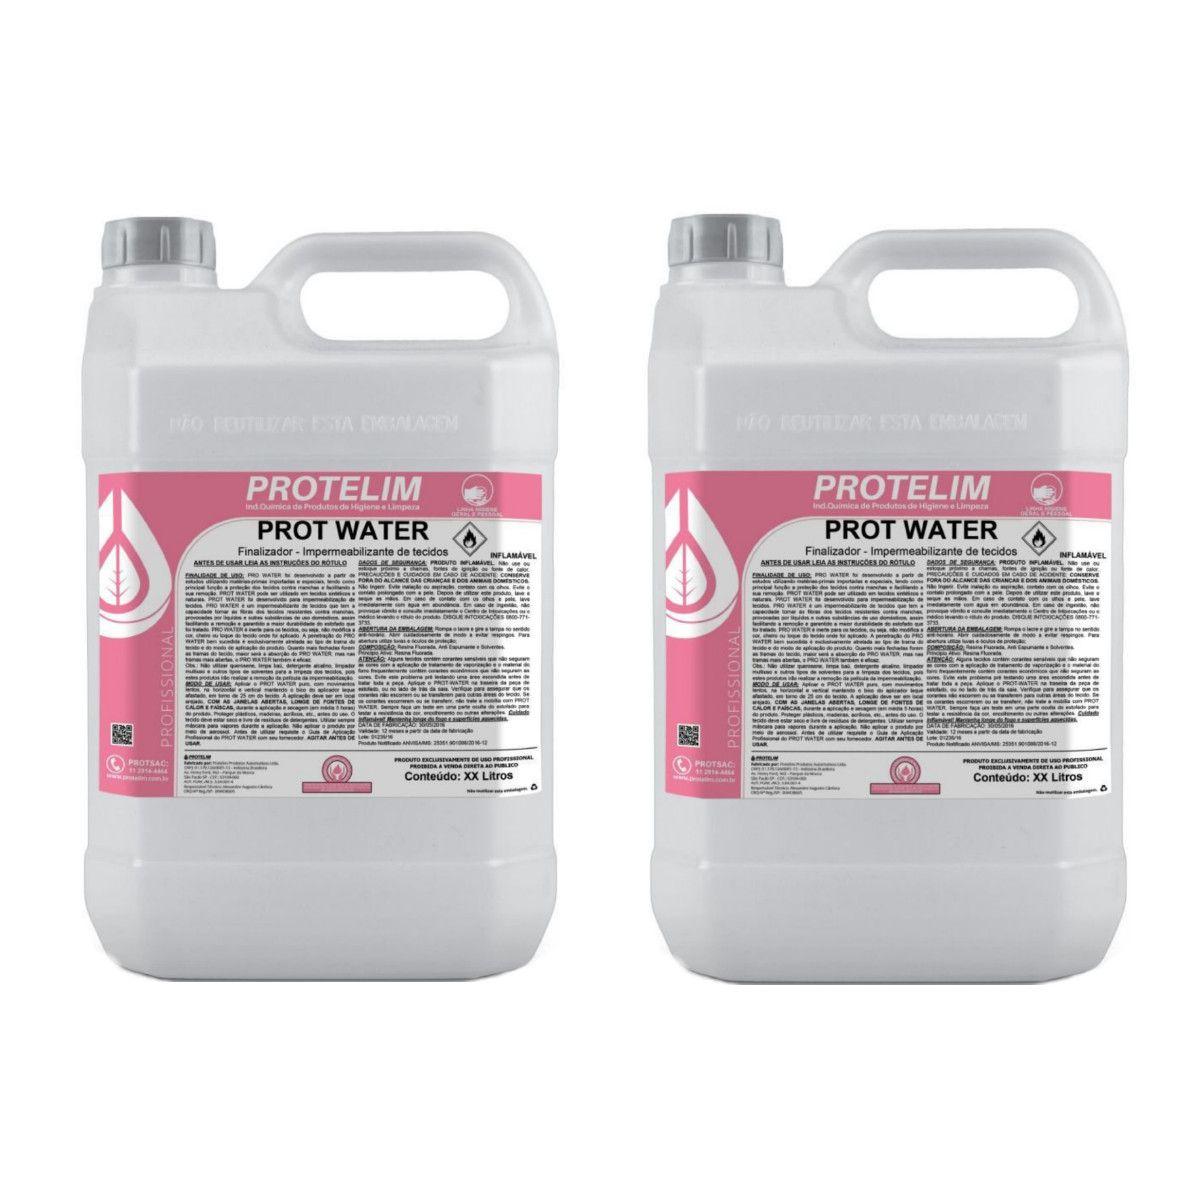 Kit Impermeabilizante para Estofado e Tecido Prot-Water Protelim 10 Litros